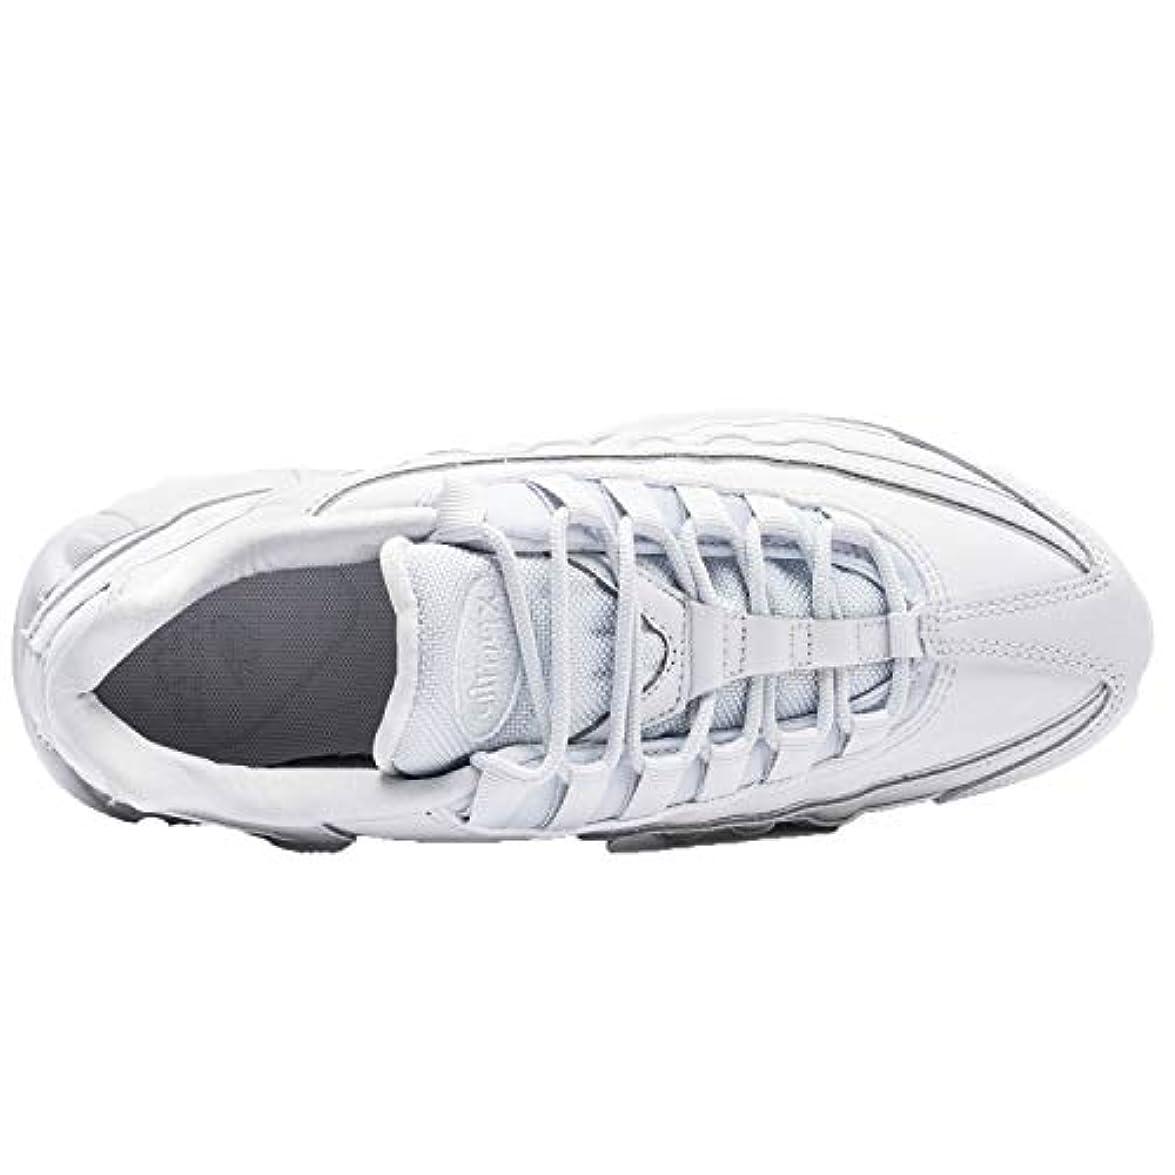 Nike Wmns Air Max 95 Lx Pure Platinum